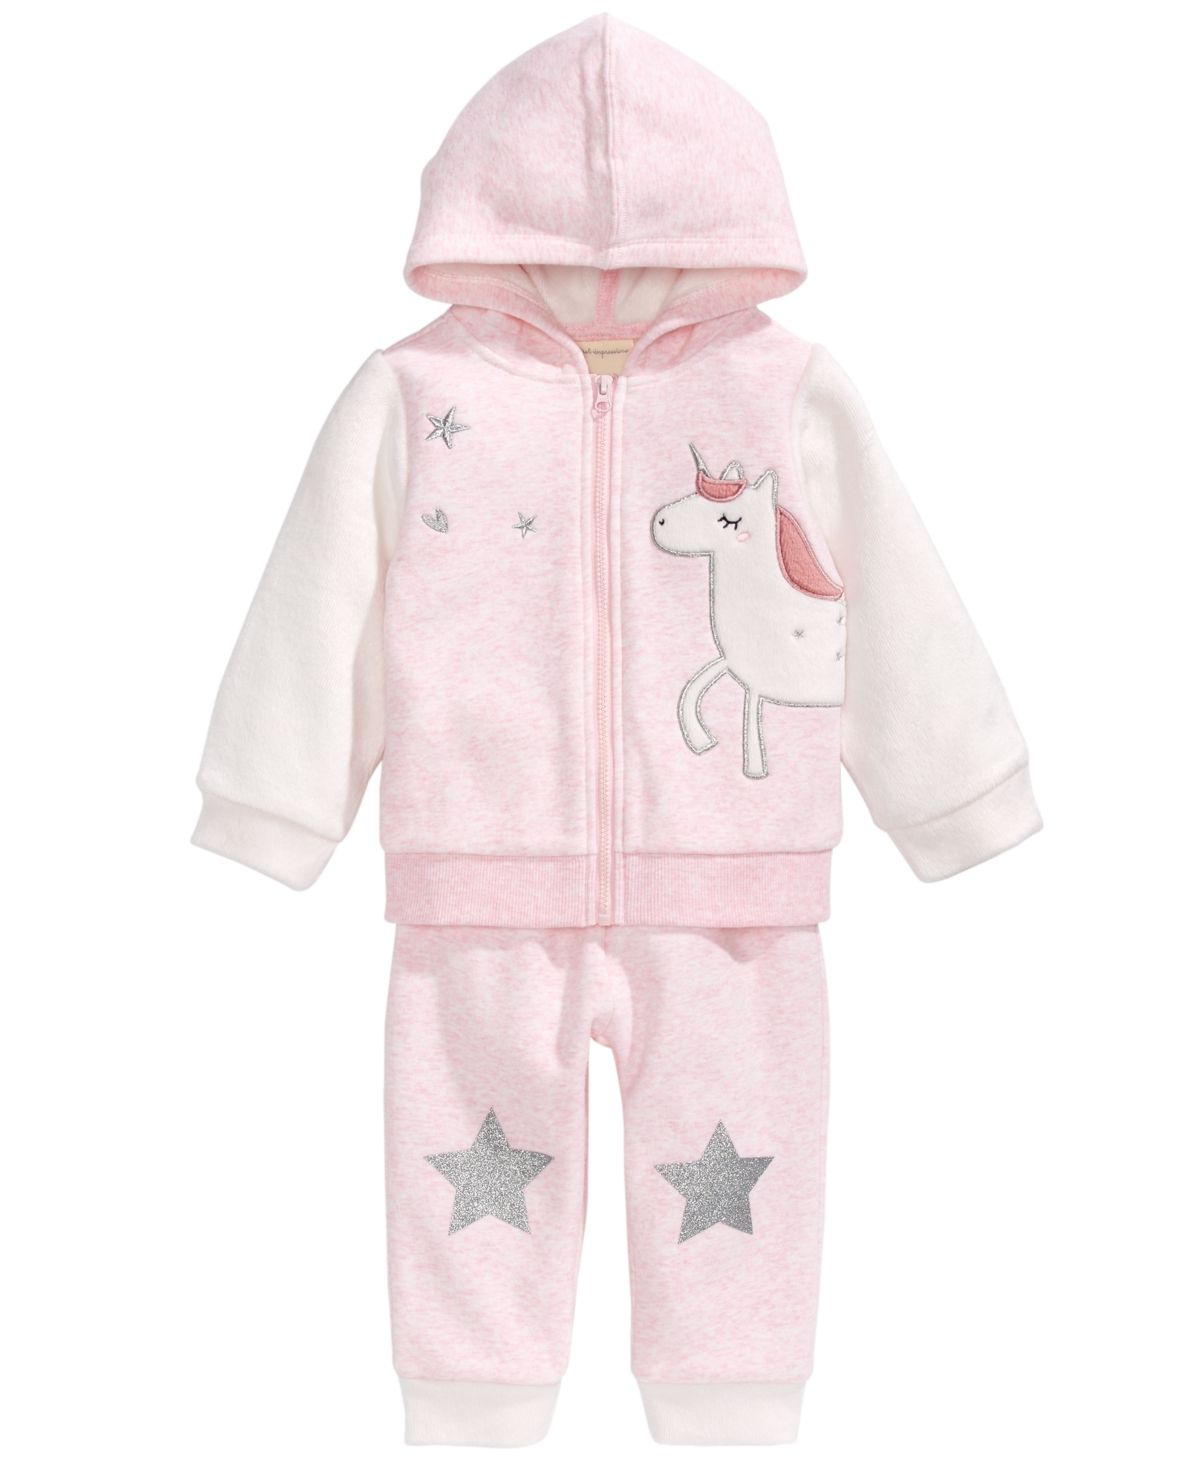 Toddler Girl Unicorn Hoodie